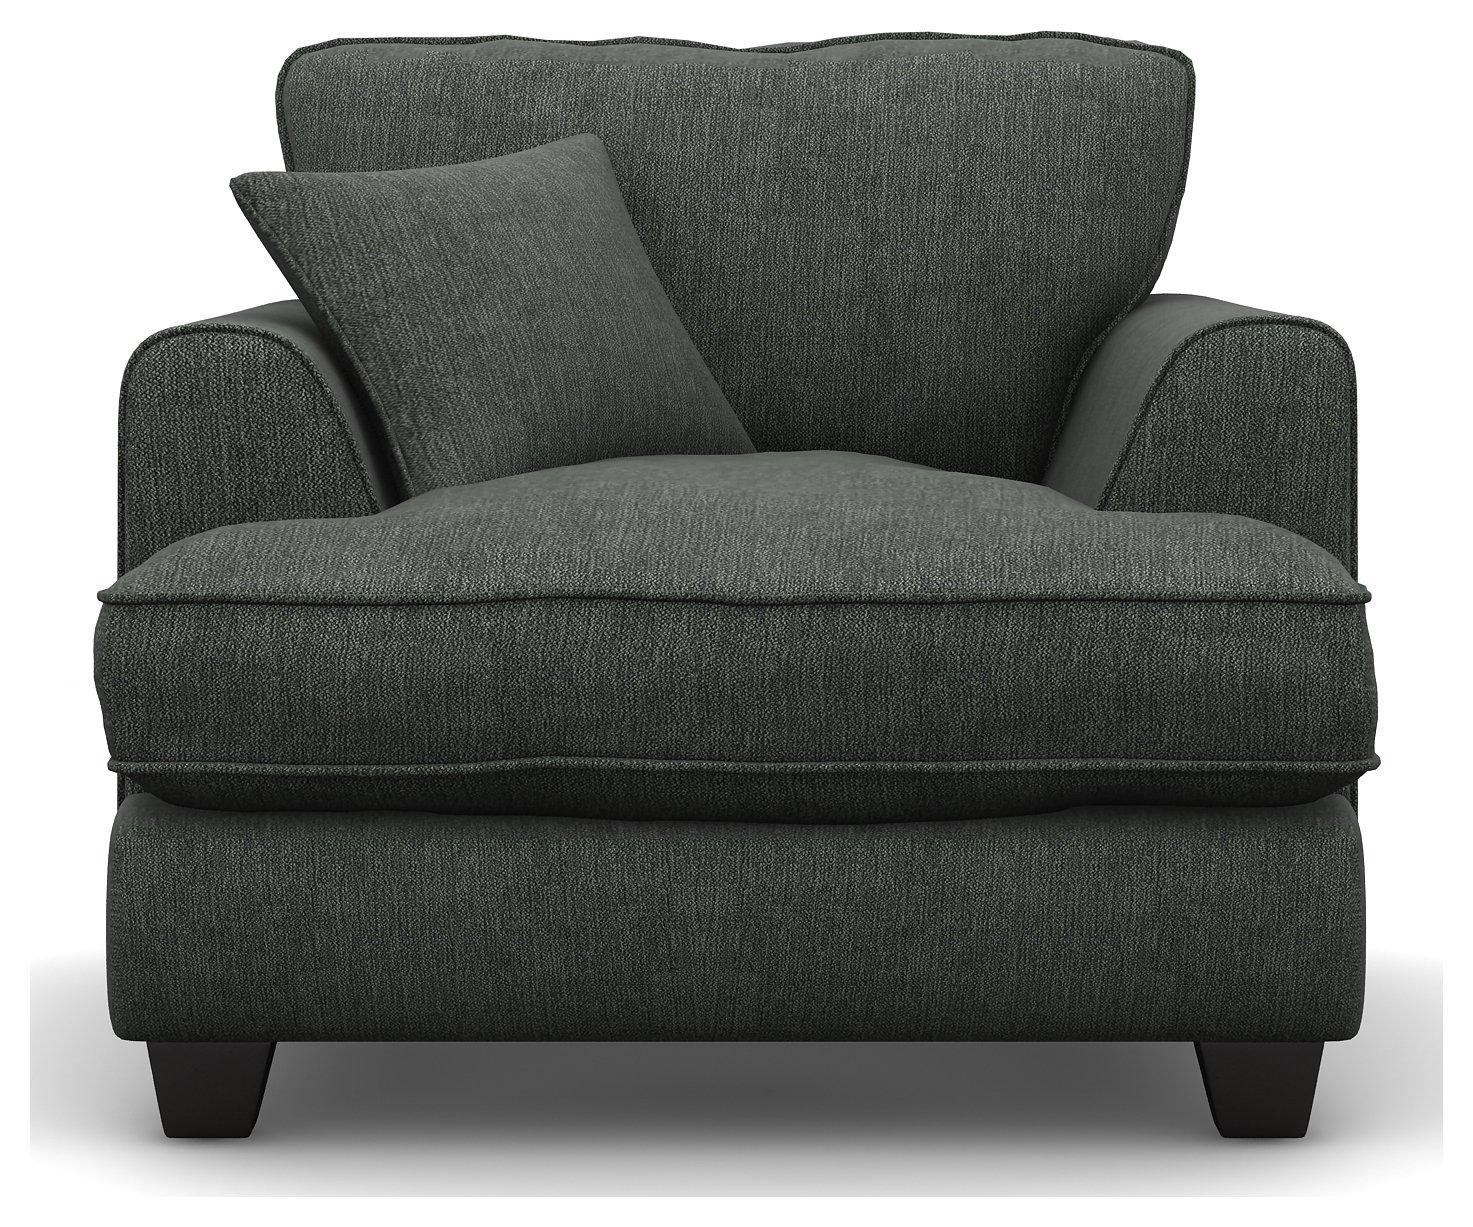 Argos Home Hampstead Fabric Armchair - Pewter